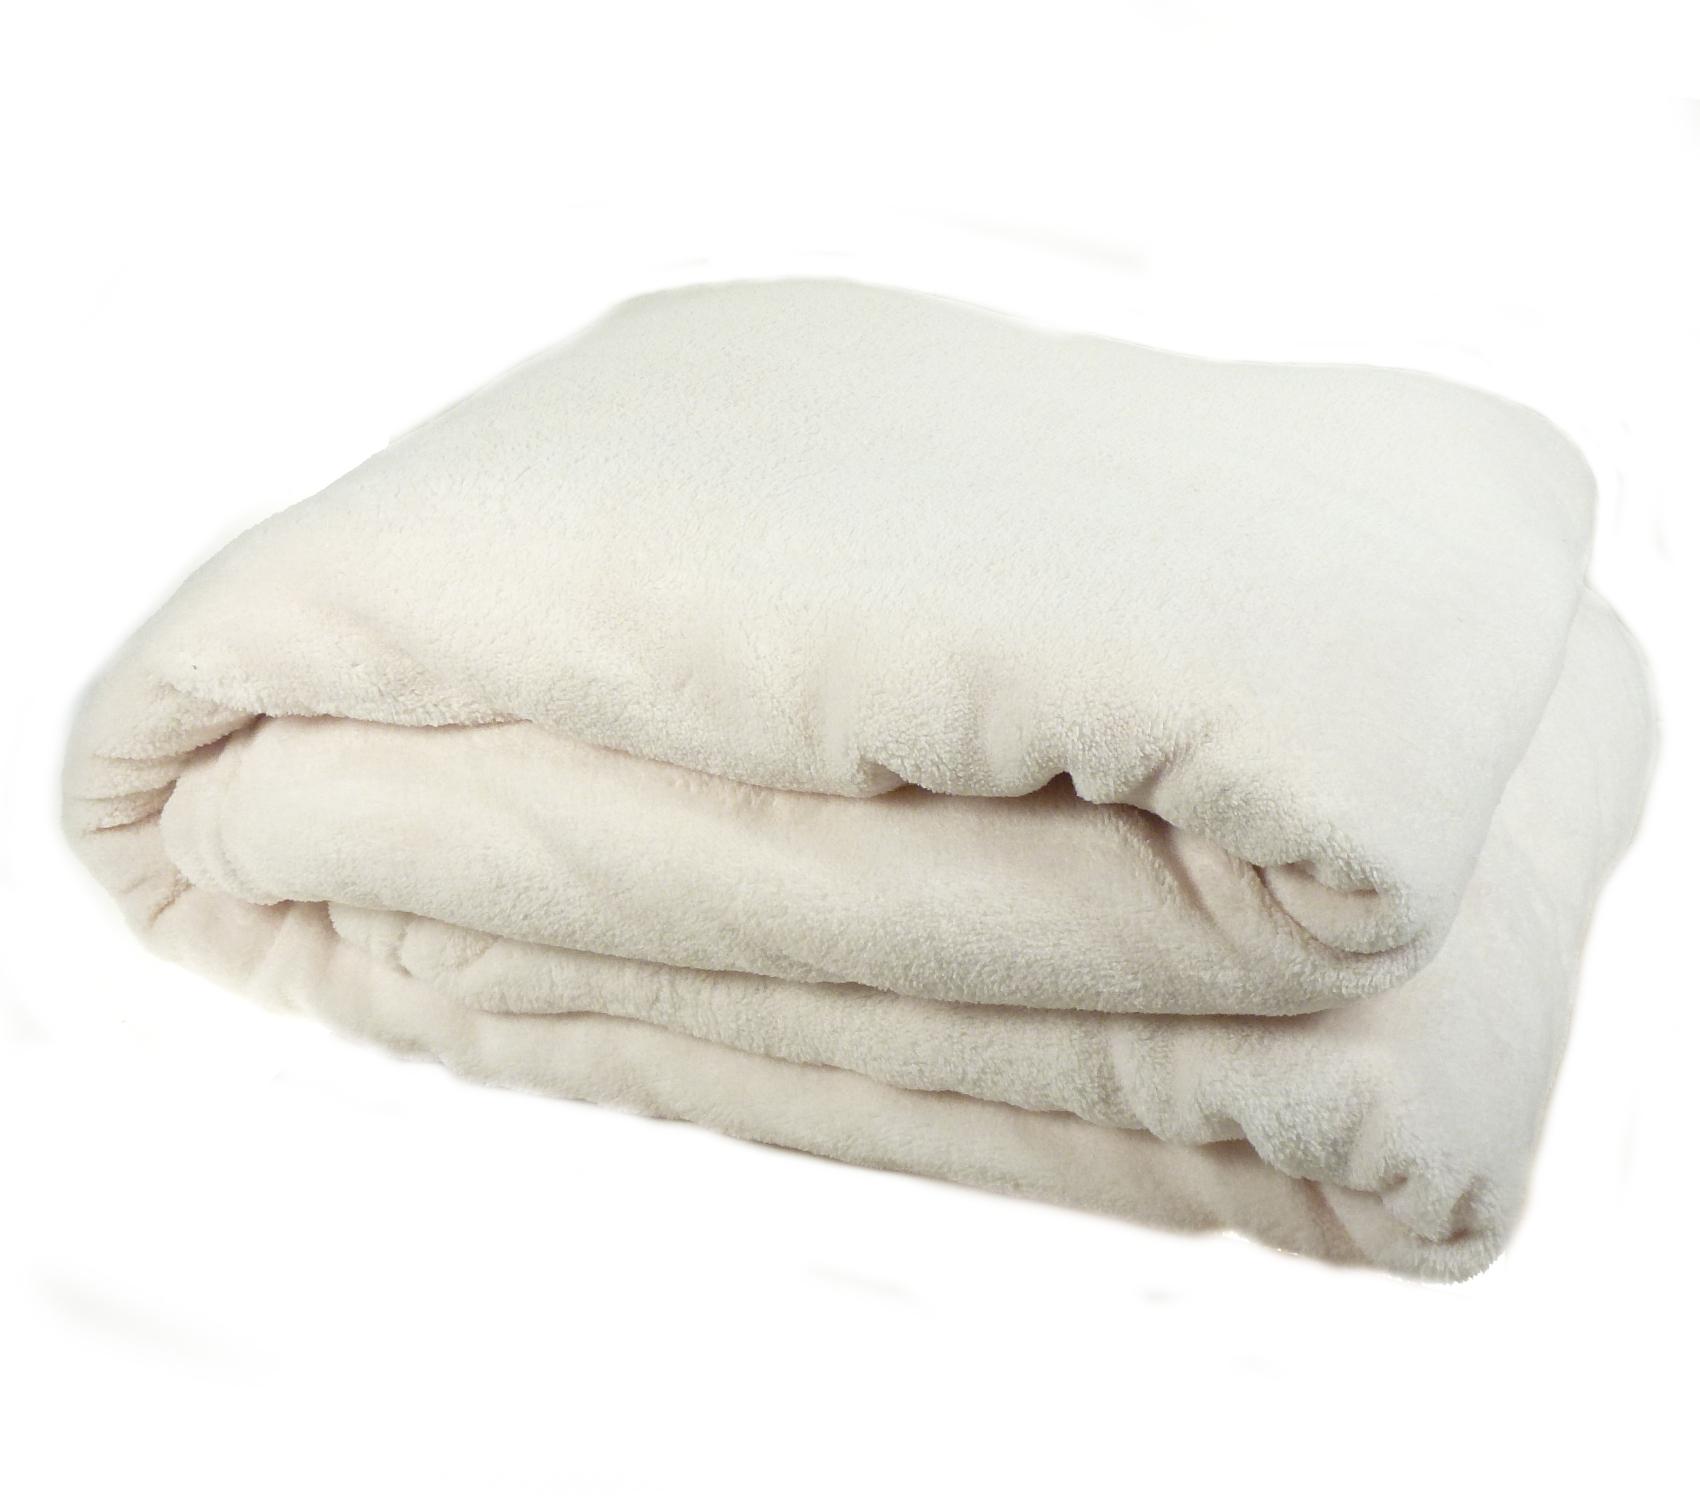 Luxury Soft Cosy Coral Fleece Throw Over Bed Sofa Home Fleecy